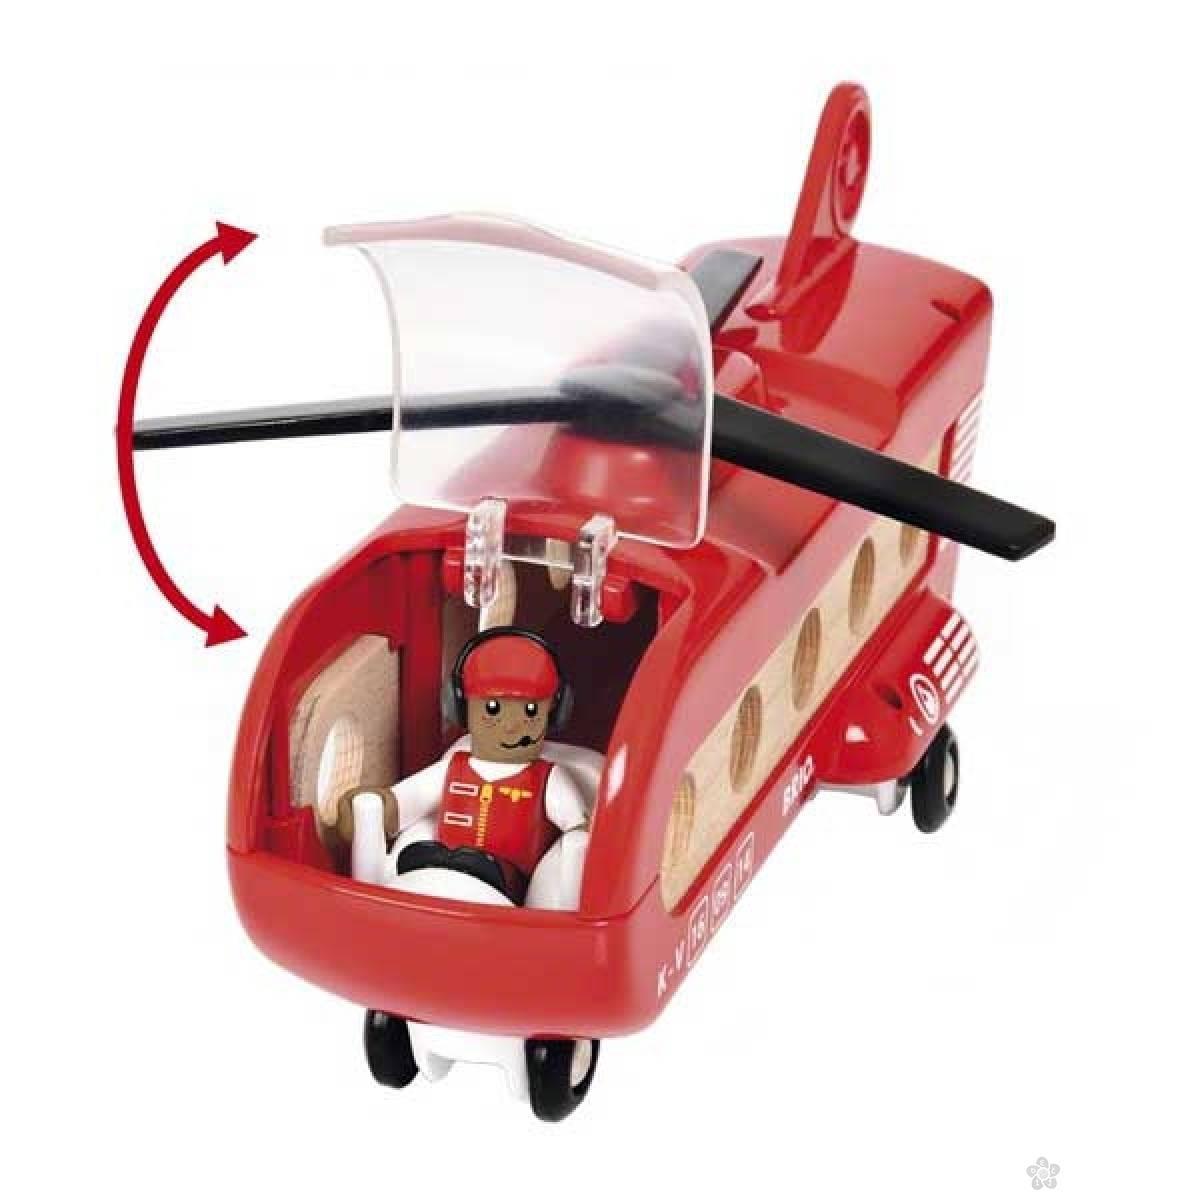 Teretni helikopter Brio BR33886